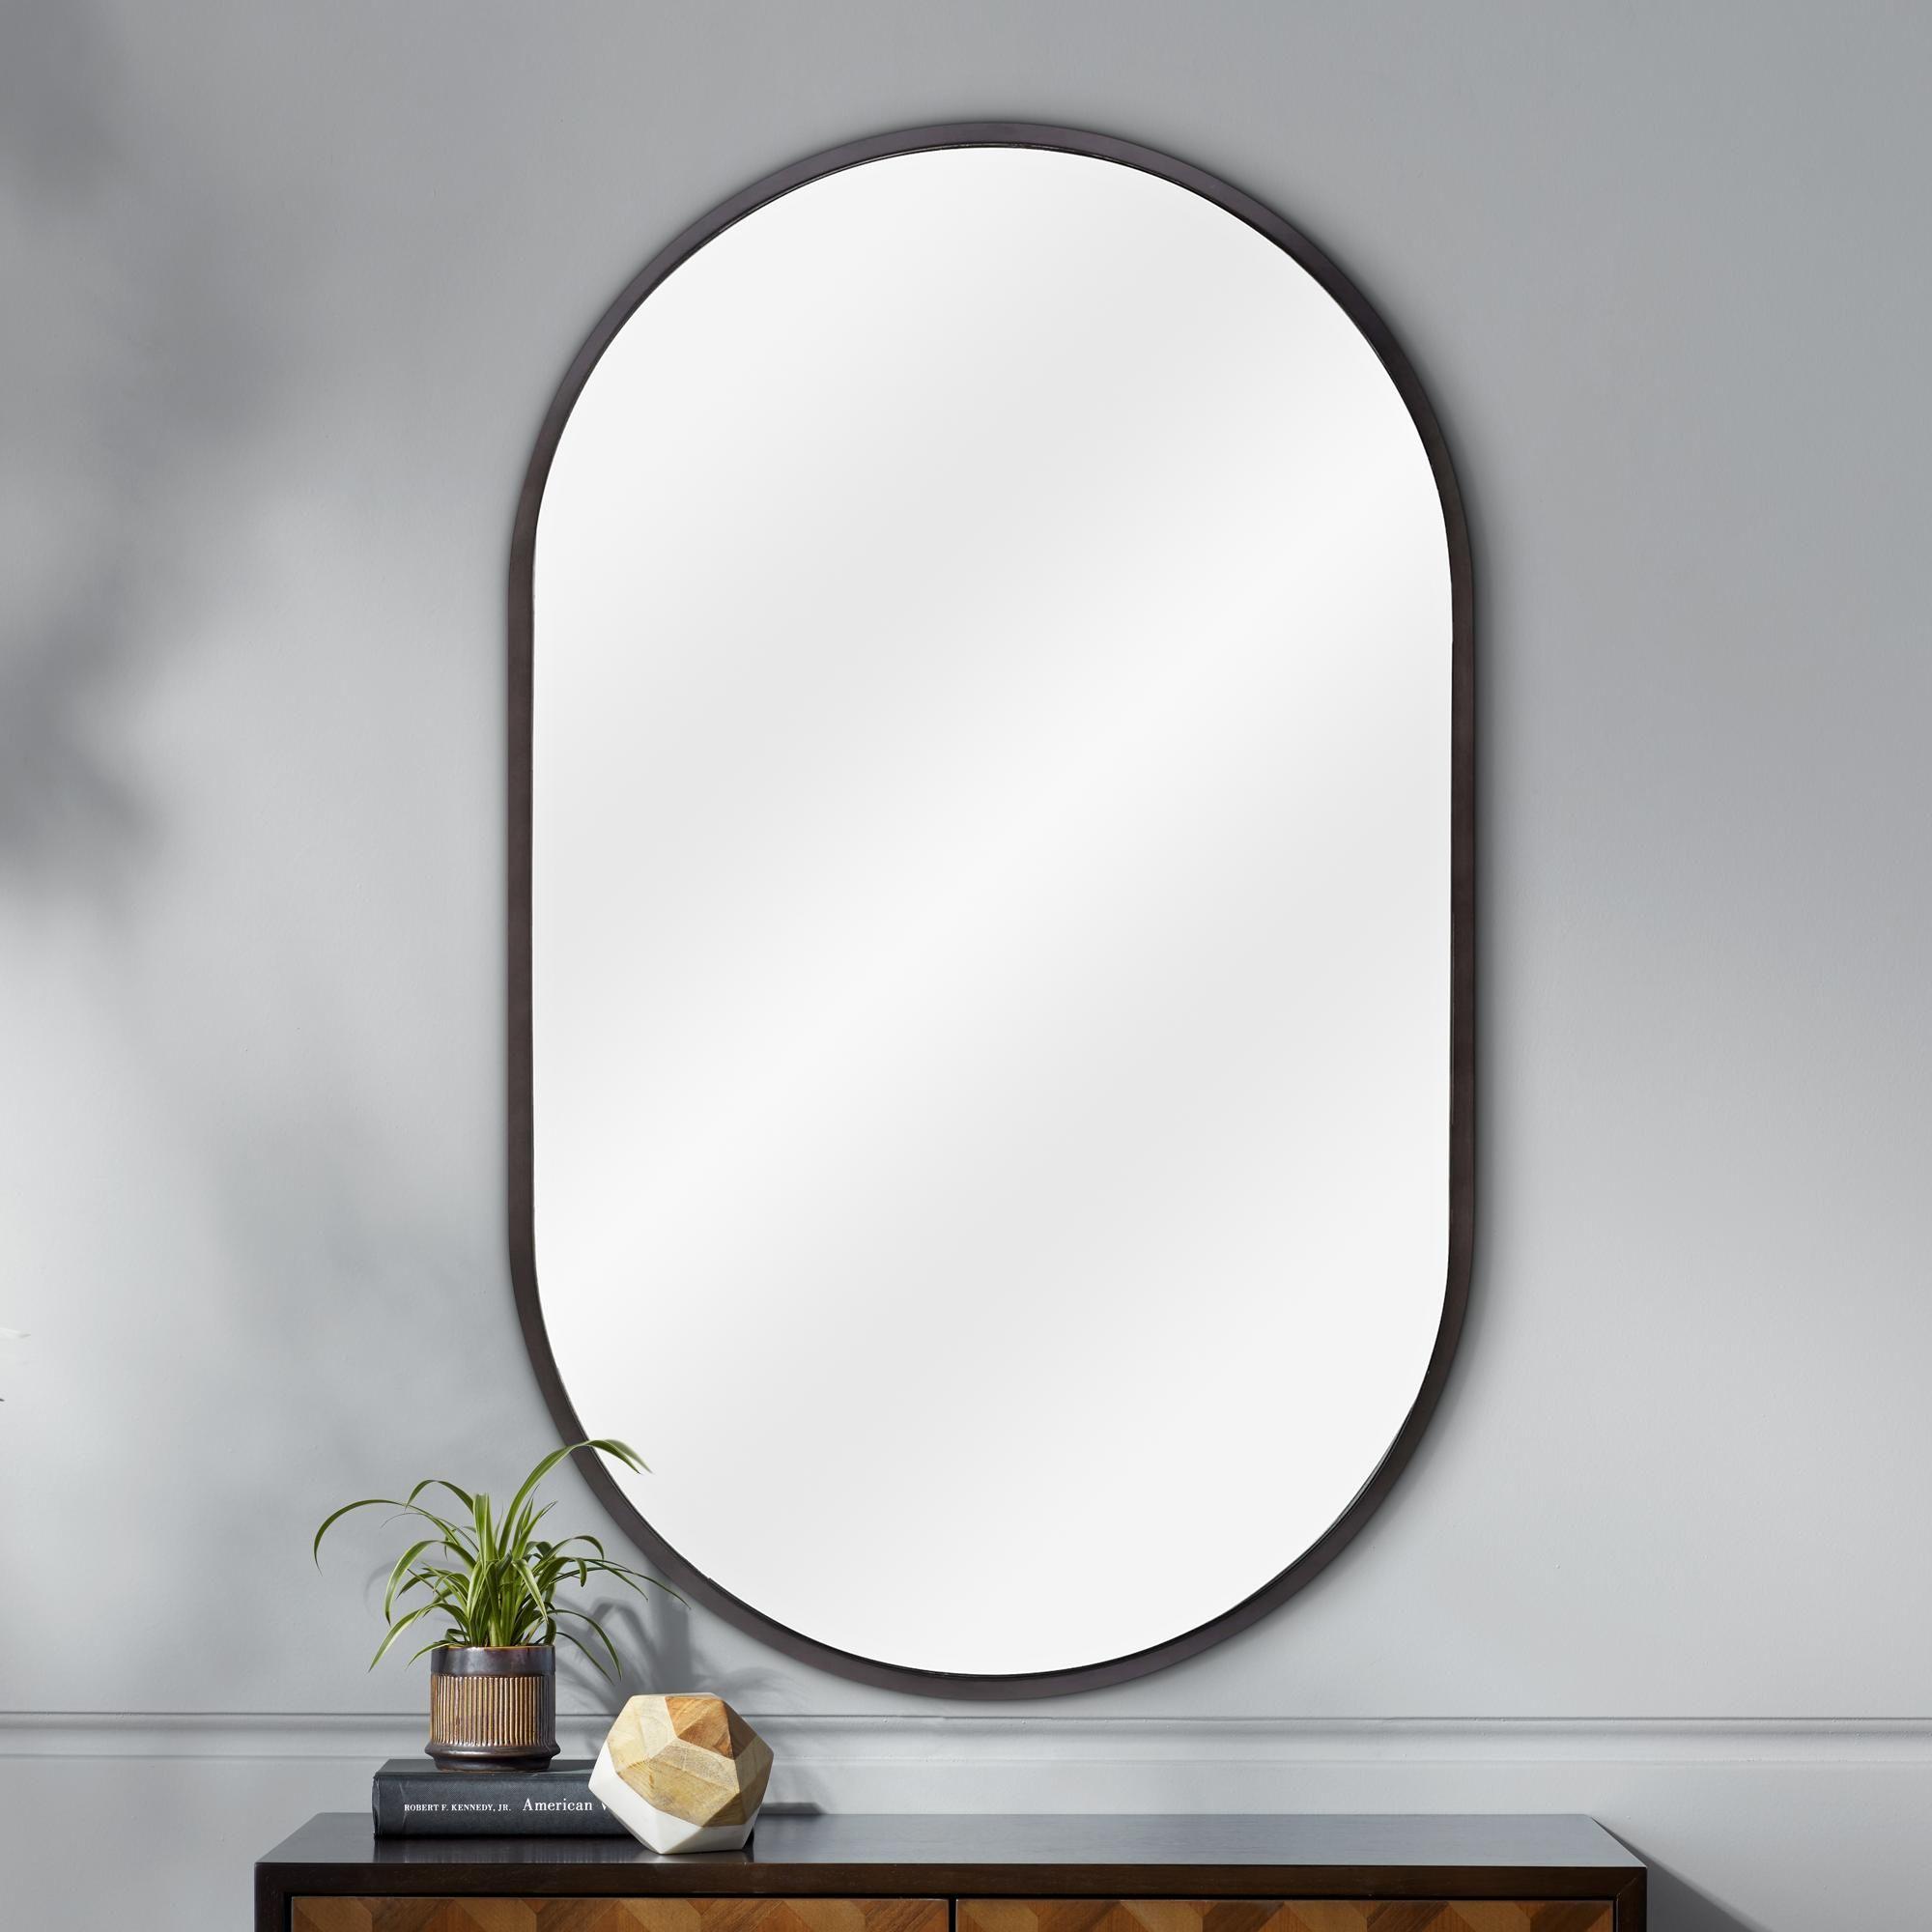 Mirrors Classics Canal Blackened Steel 24 X 40 Wall Mirror Mirror Wall Frames On Wall Mirror